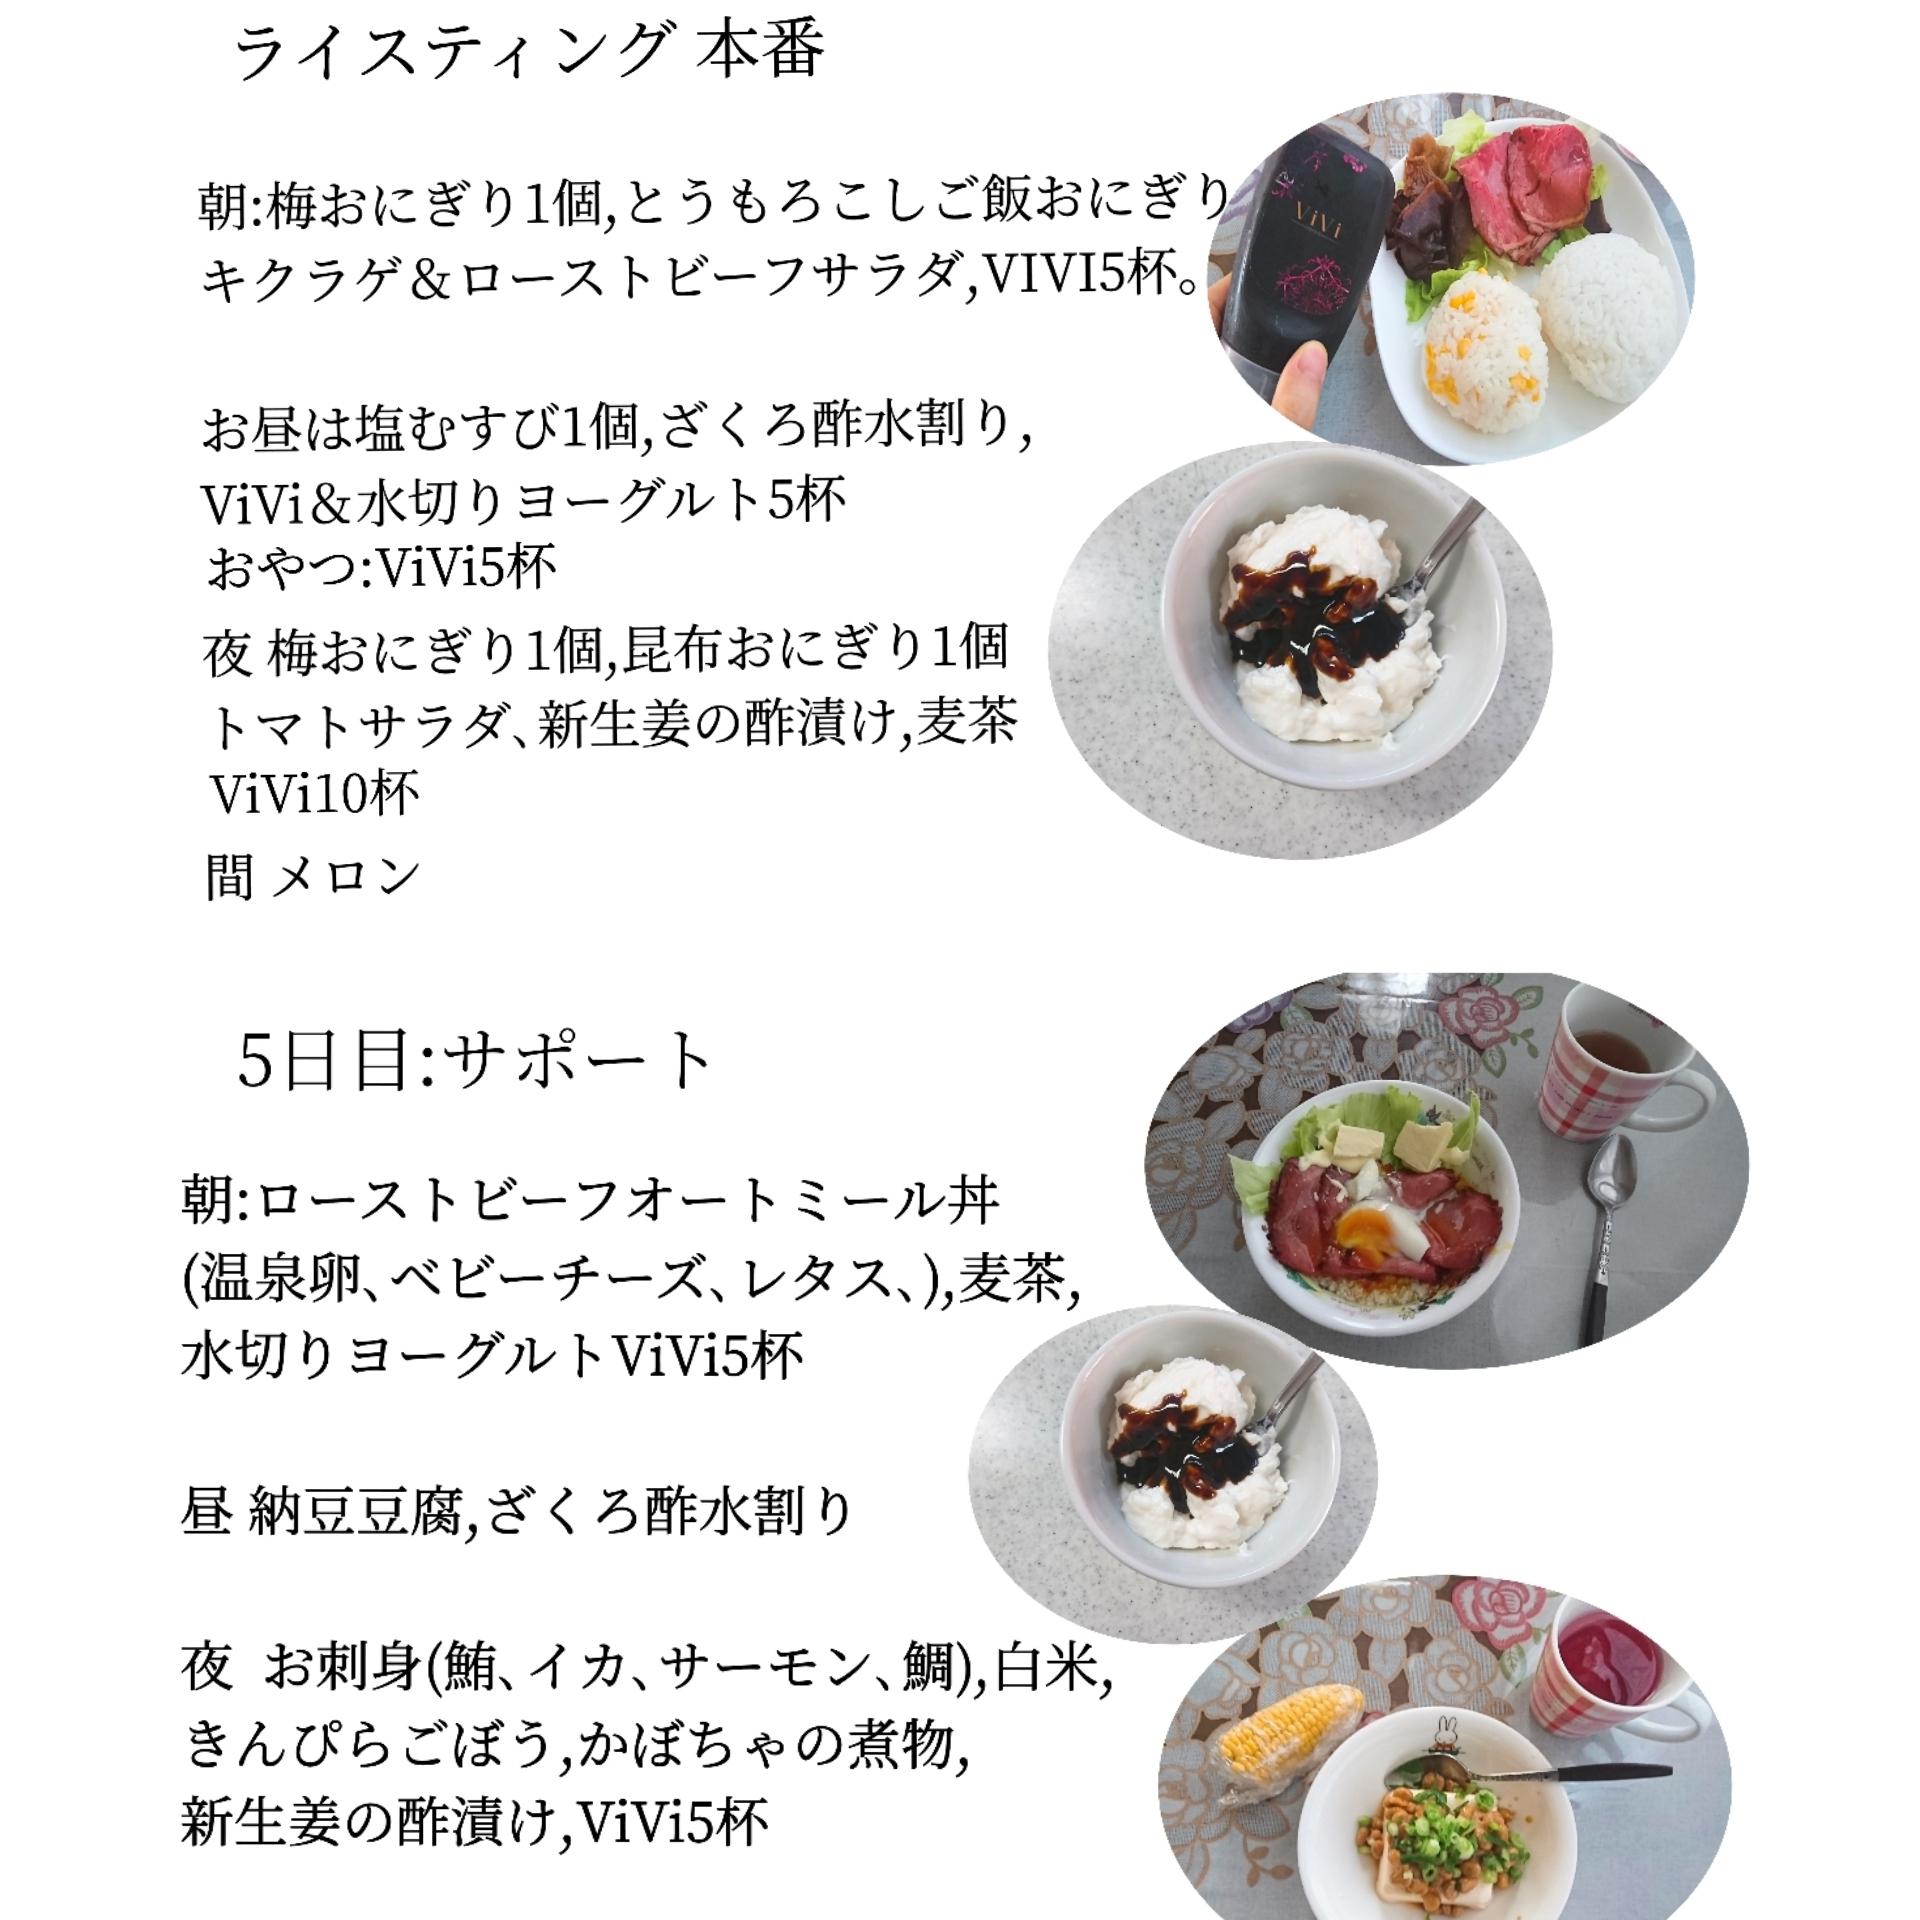 Salon de NOEL(サロン・ド ノエル)植物発酵エキス ViViを使ったYuKaRi♡さんのクチコミ画像7